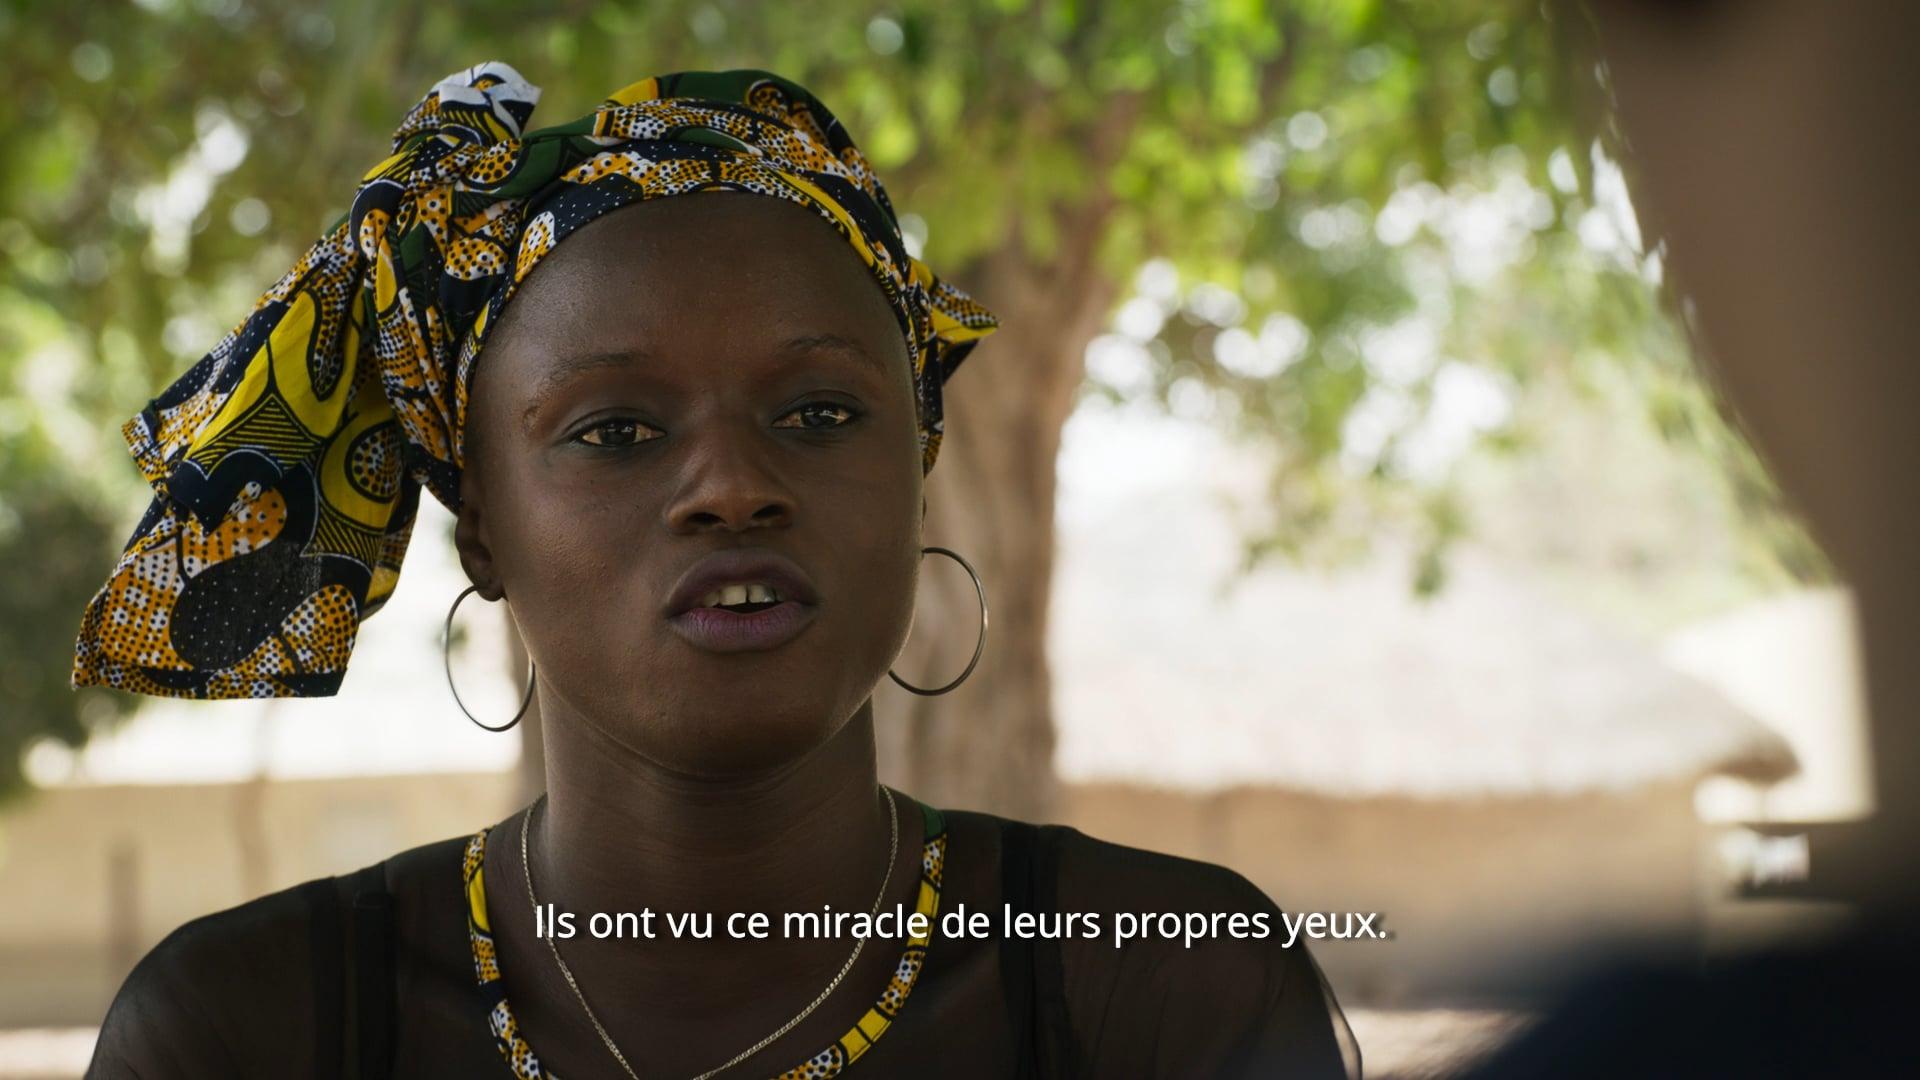 Trailer - À la recherche d'Aline by Rokhaya Marieme Balde